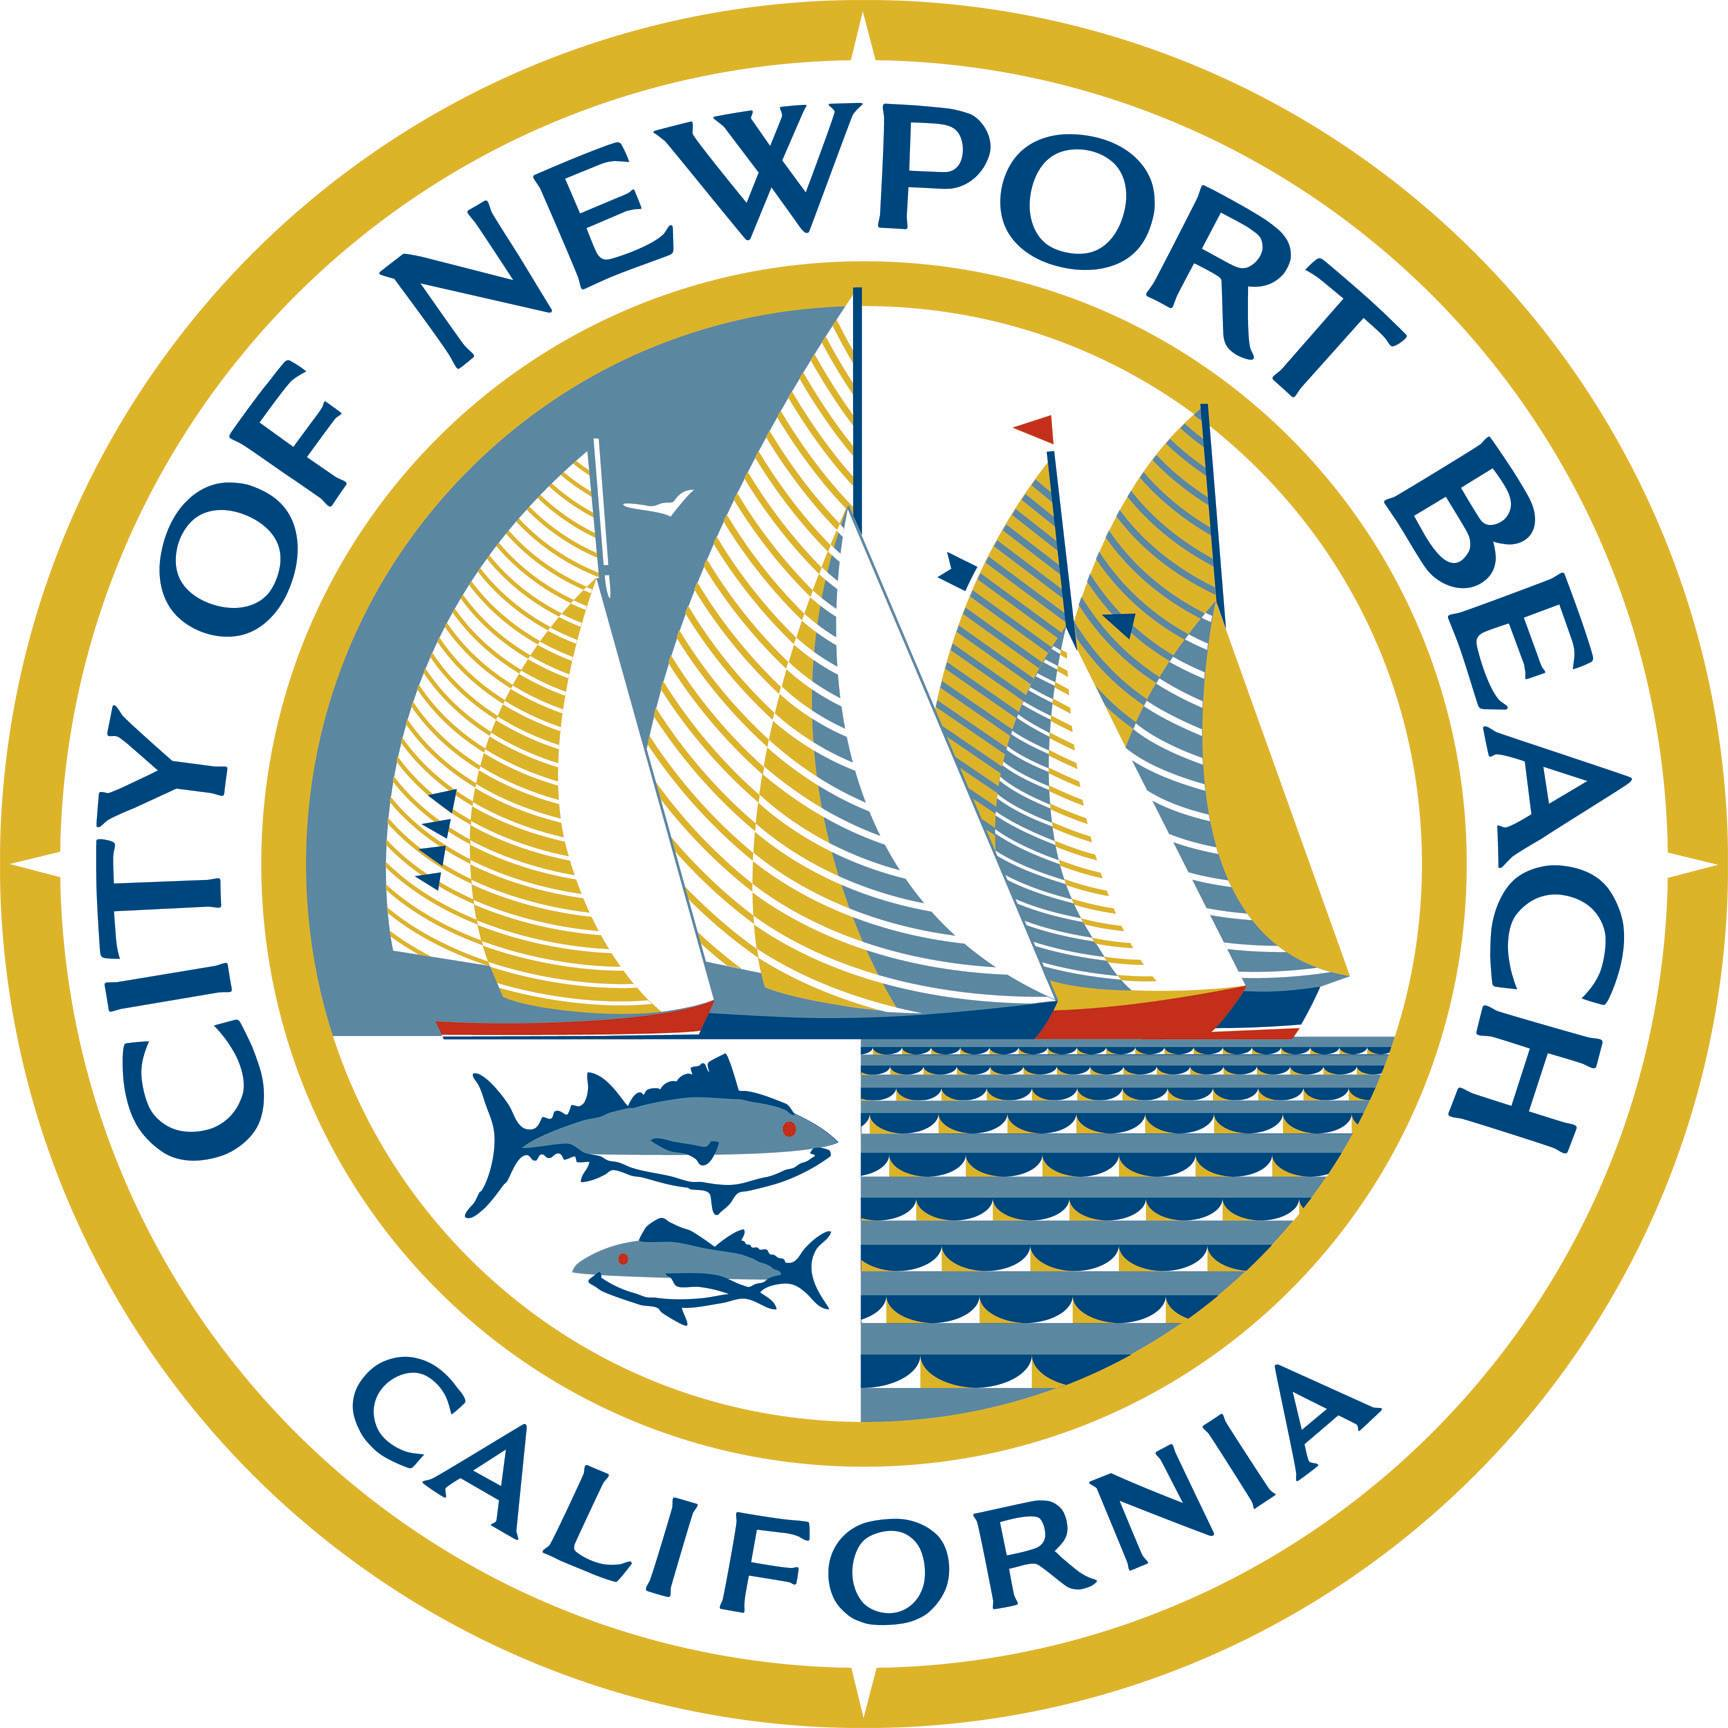 SEO Services in Newport Beach